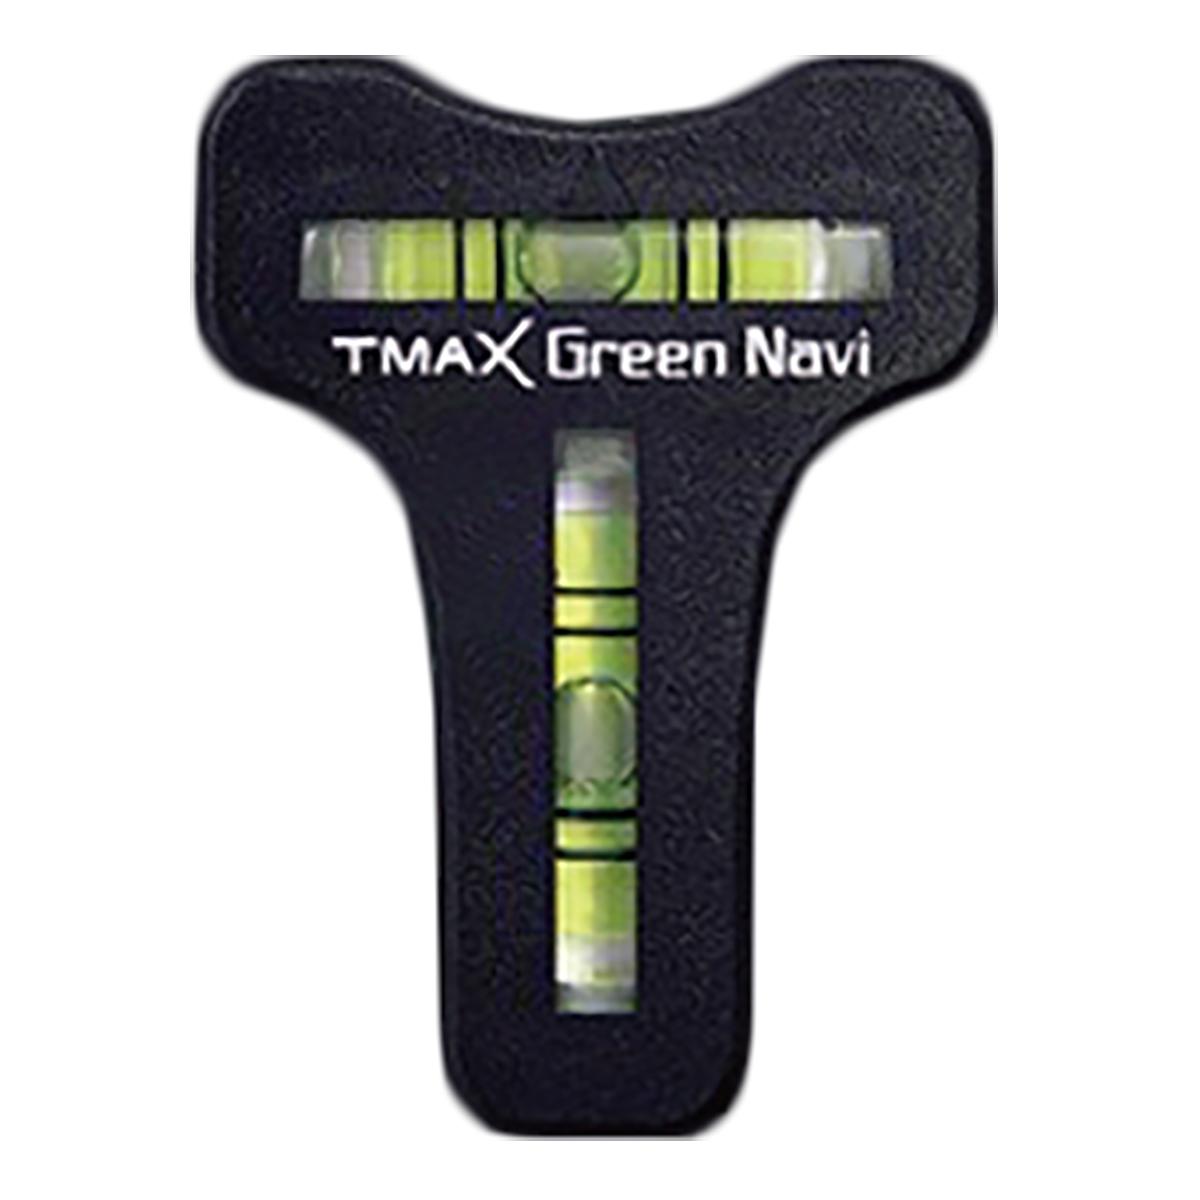 MATRO GOLF グリーンナビ水平器マーカー